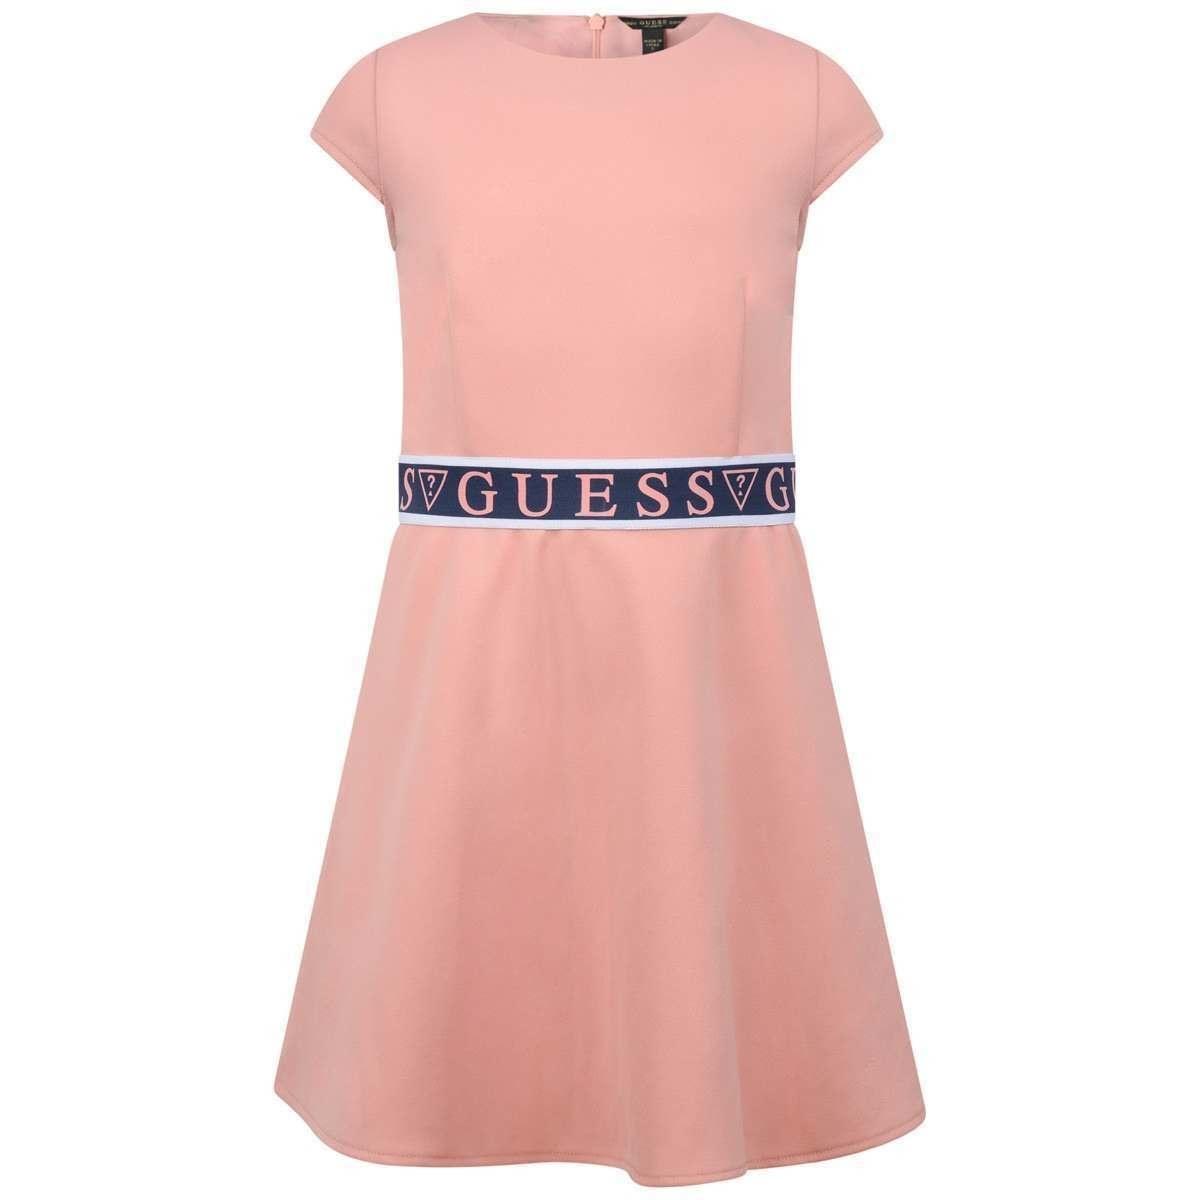 Guess Guess Pink Dress with Logo Band Waist